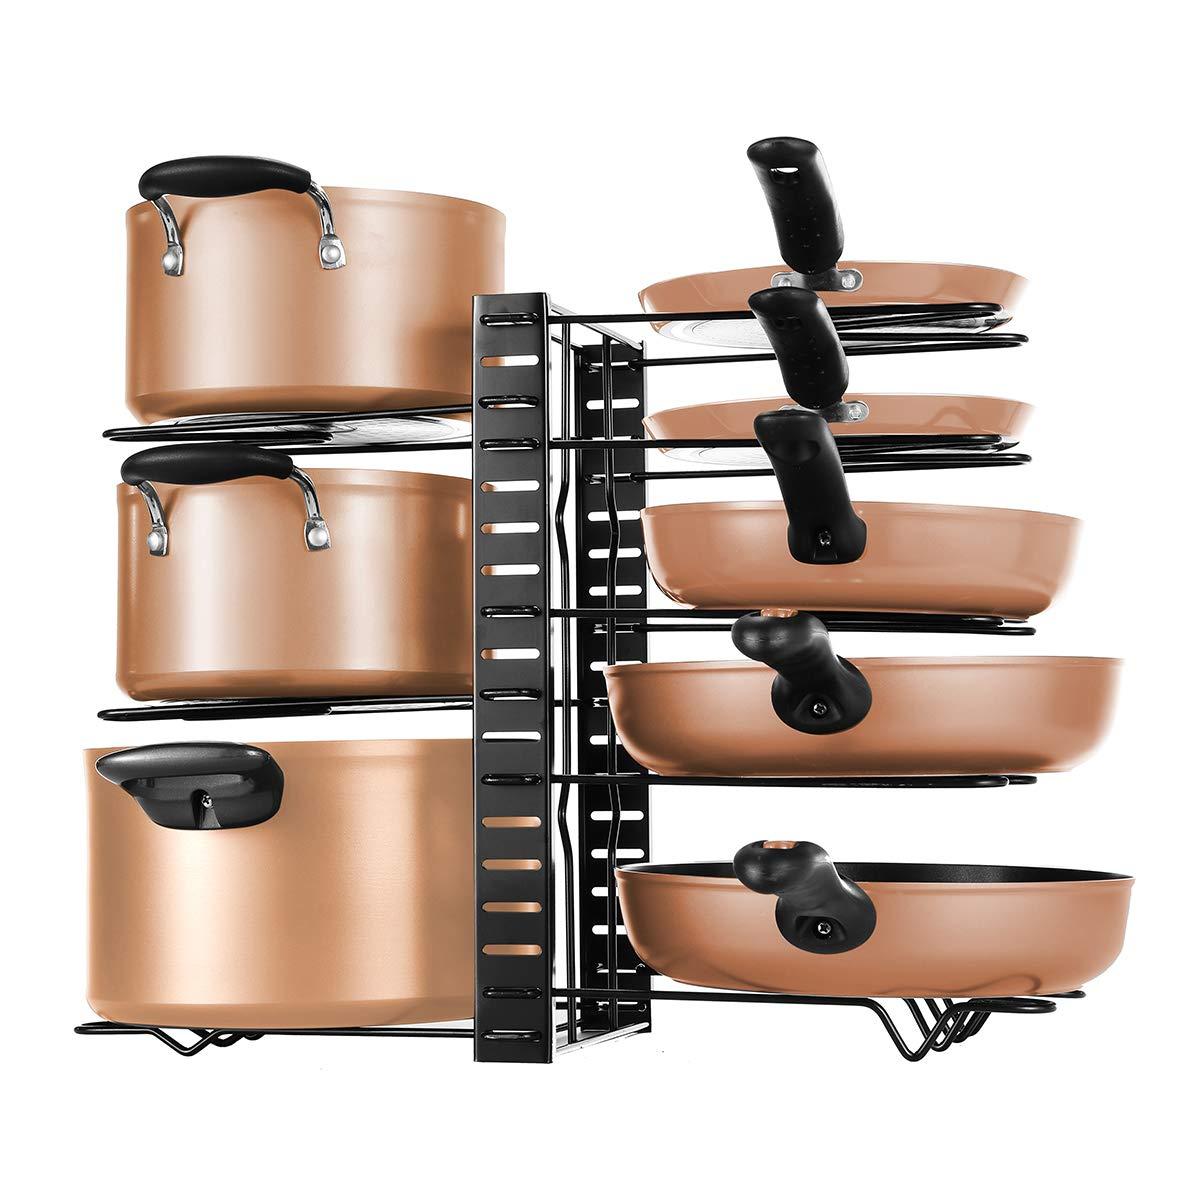 Pot Rack Organizers, 8 Tiers Pots and Pans Organizer, Adjustable Pot Lid Holders & Pan Rack for Kitchen Counter and Cabinet, Lid Organizer for Pots and Pans With 3 DIY Methods(Black)